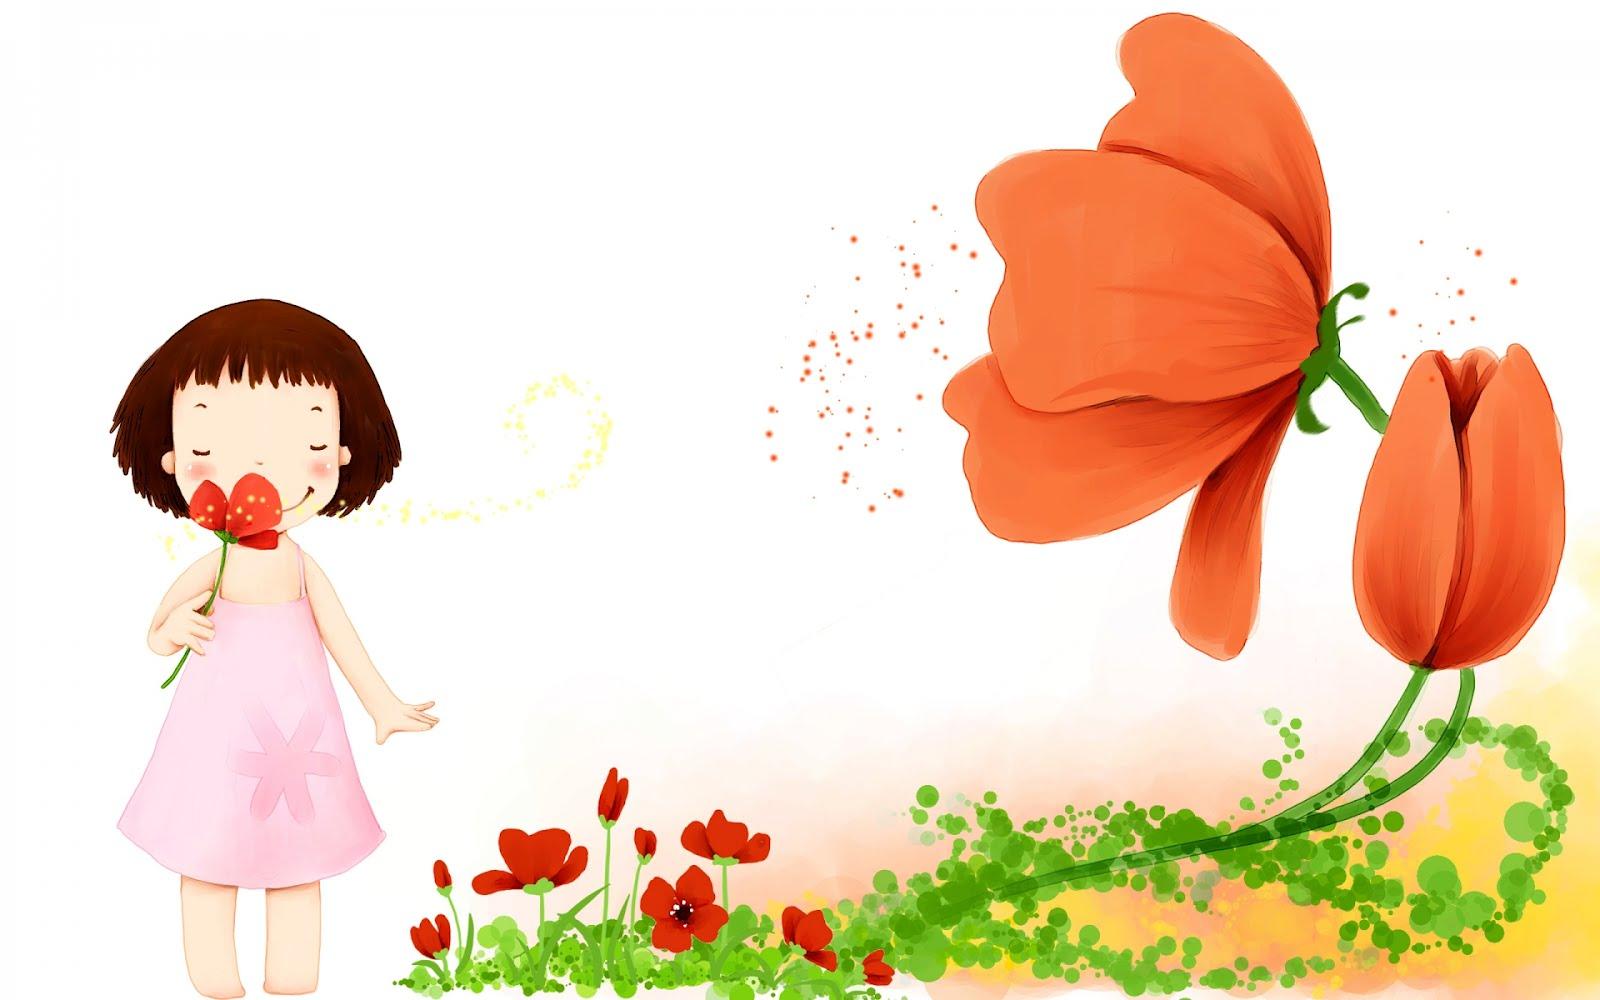 La naturaleza en la infancia